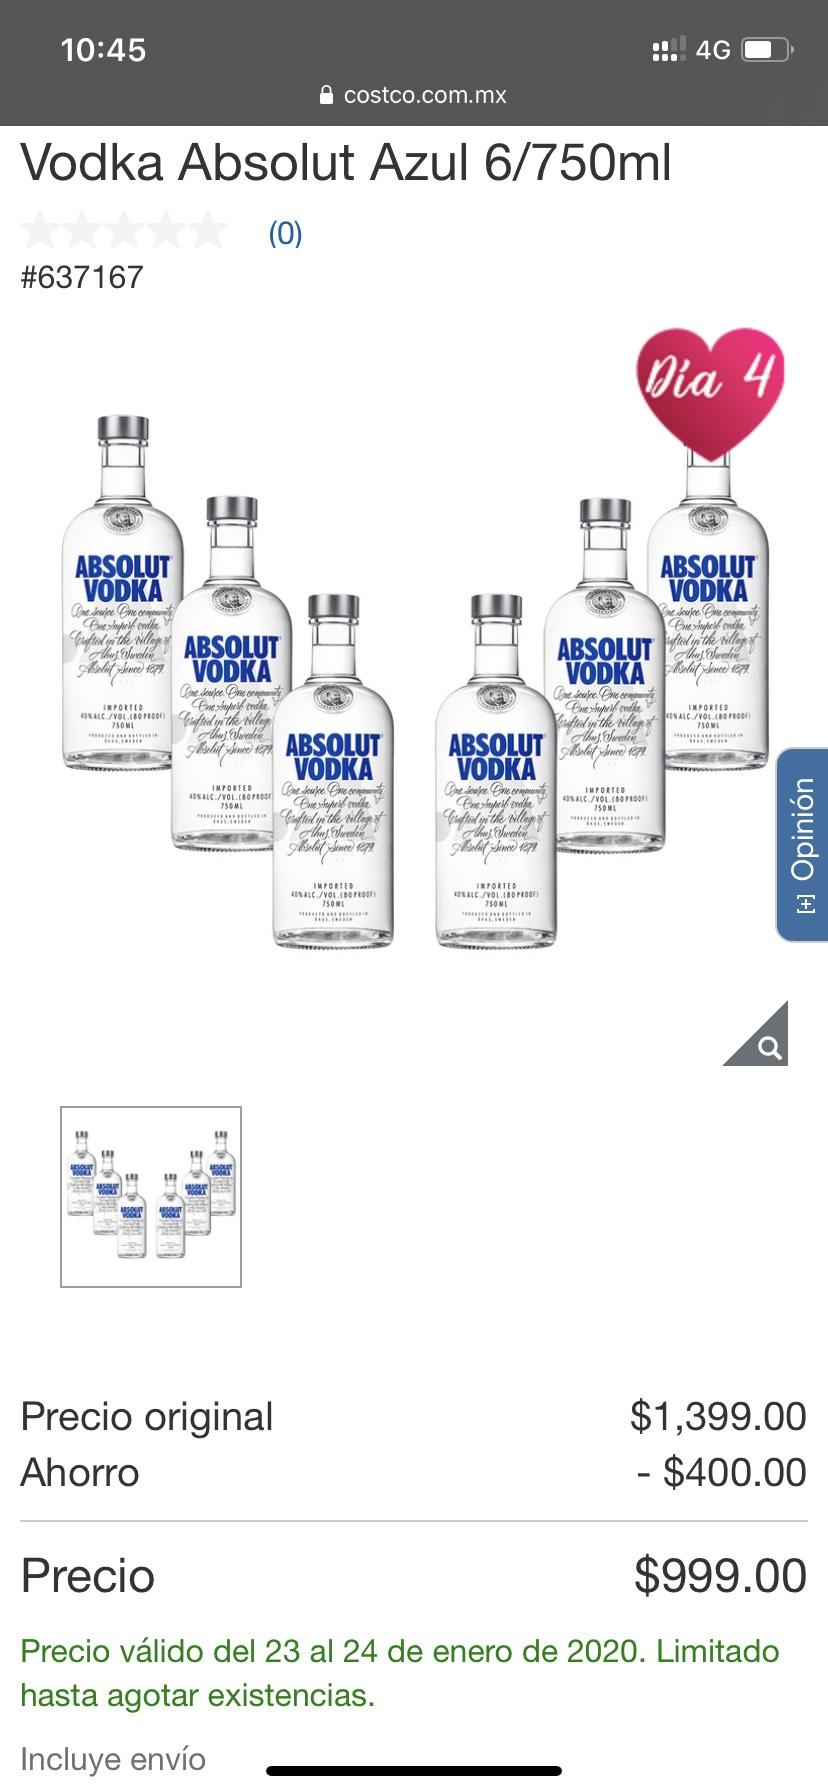 Costco: Vodka Absolut Azul 6/750ml